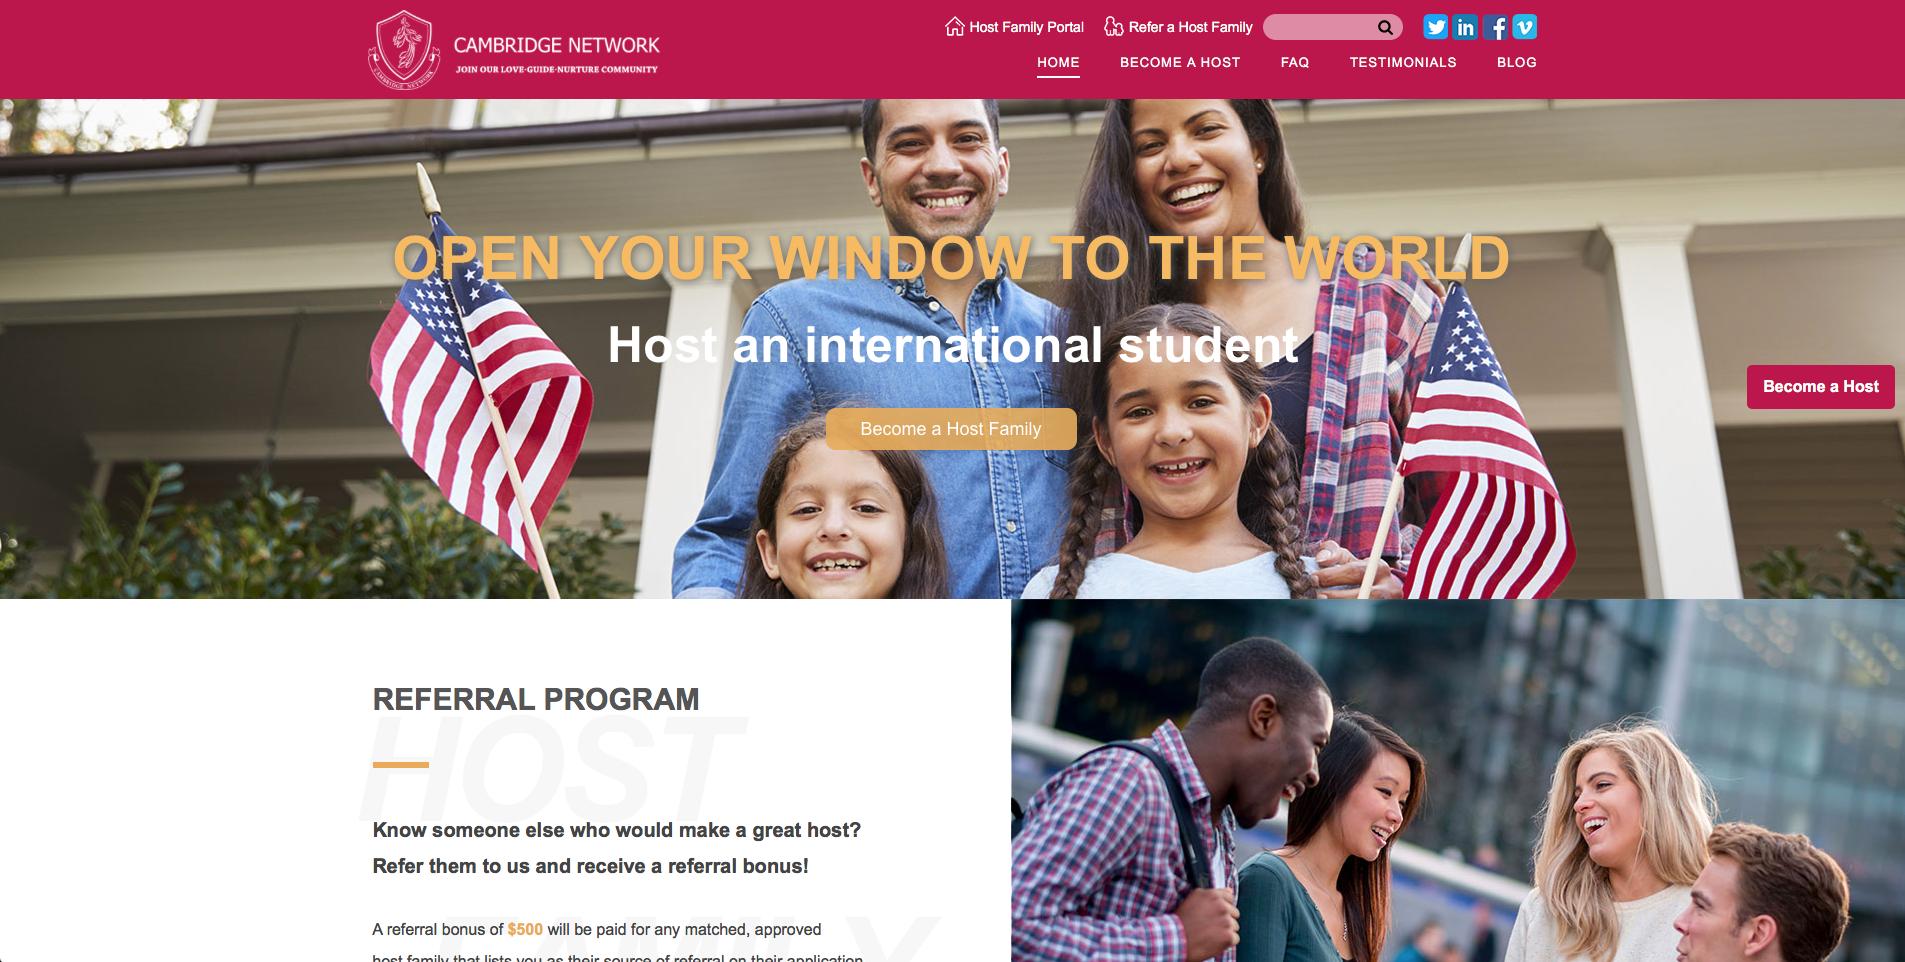 Cambridge Network Host Family Website